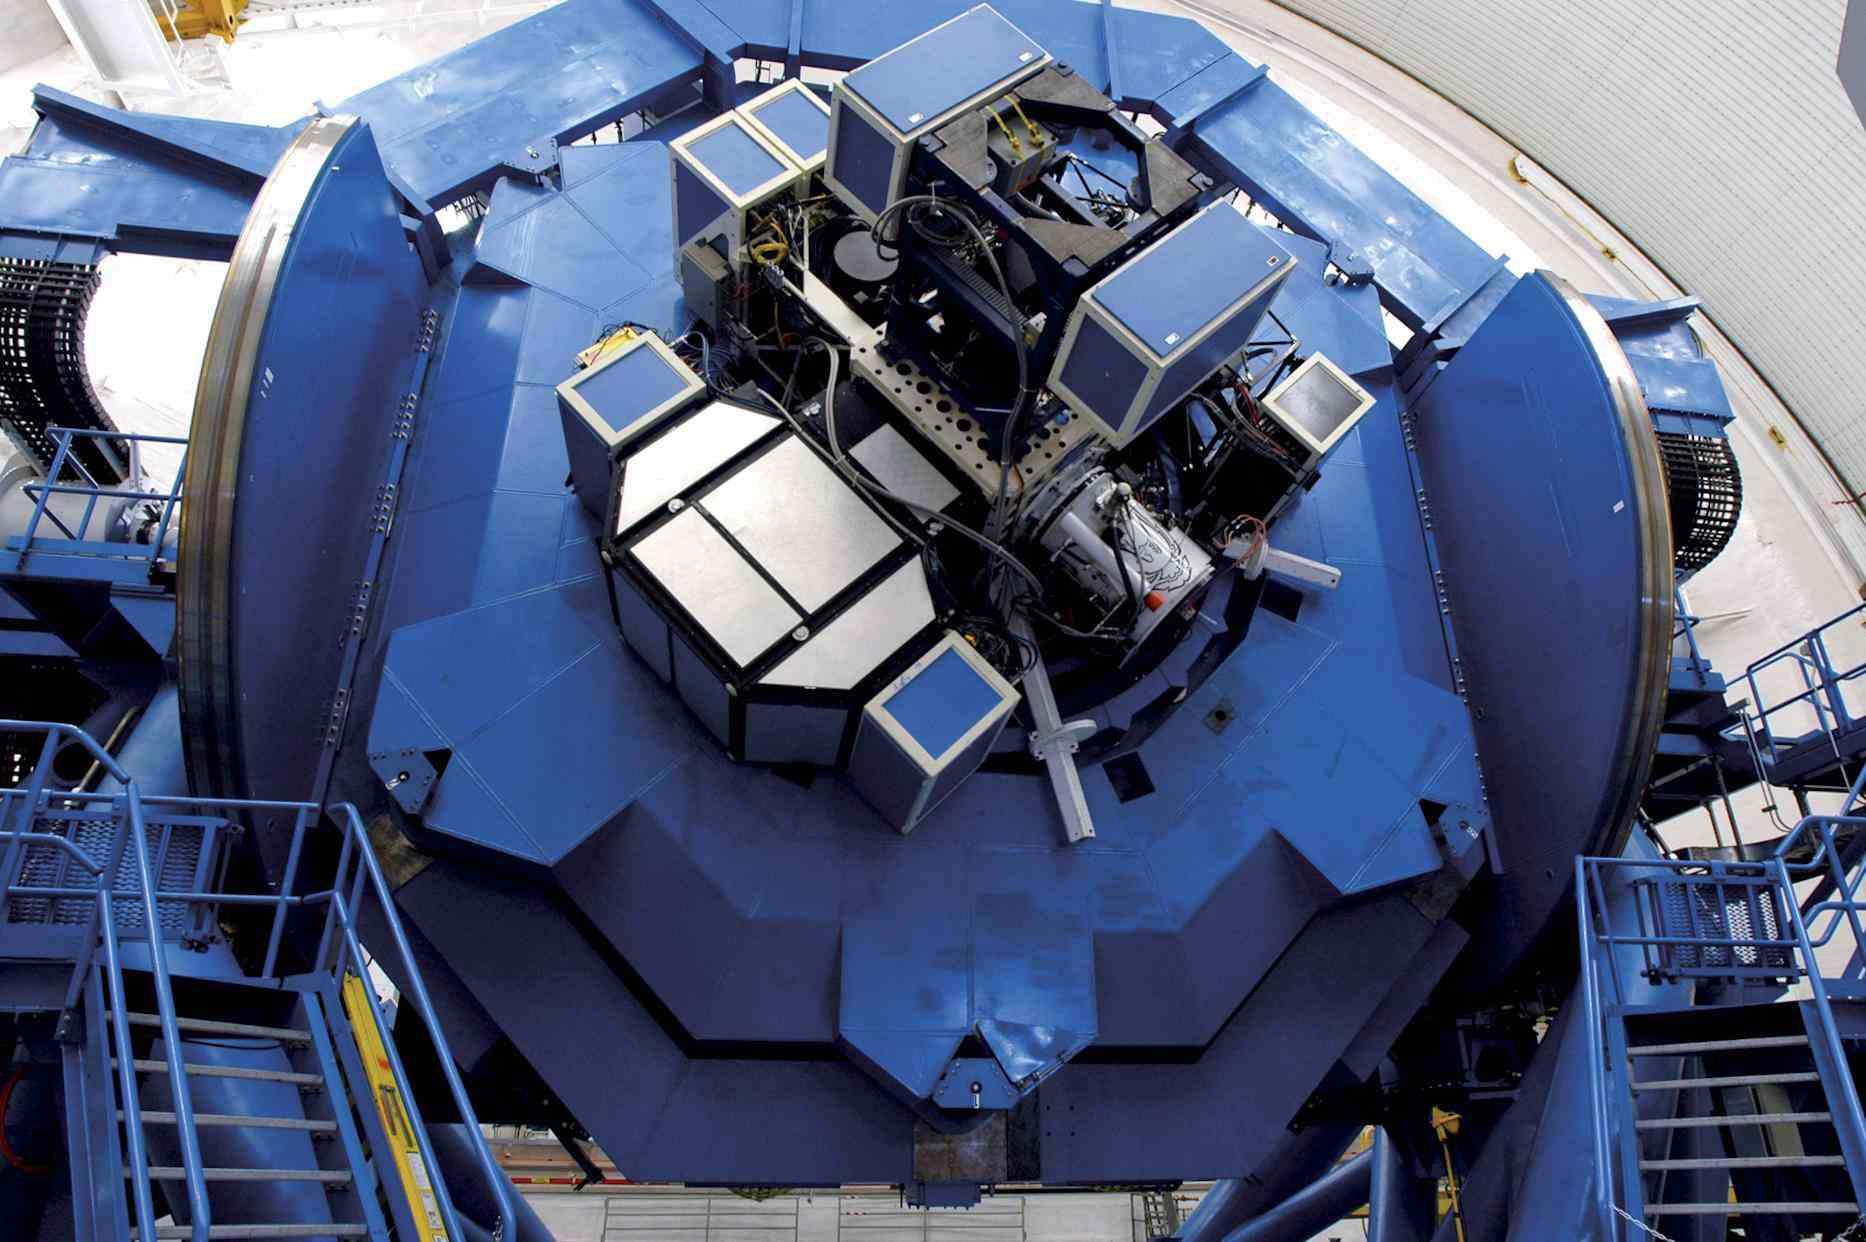 Instrument support mechanism for Gemini telescopes.